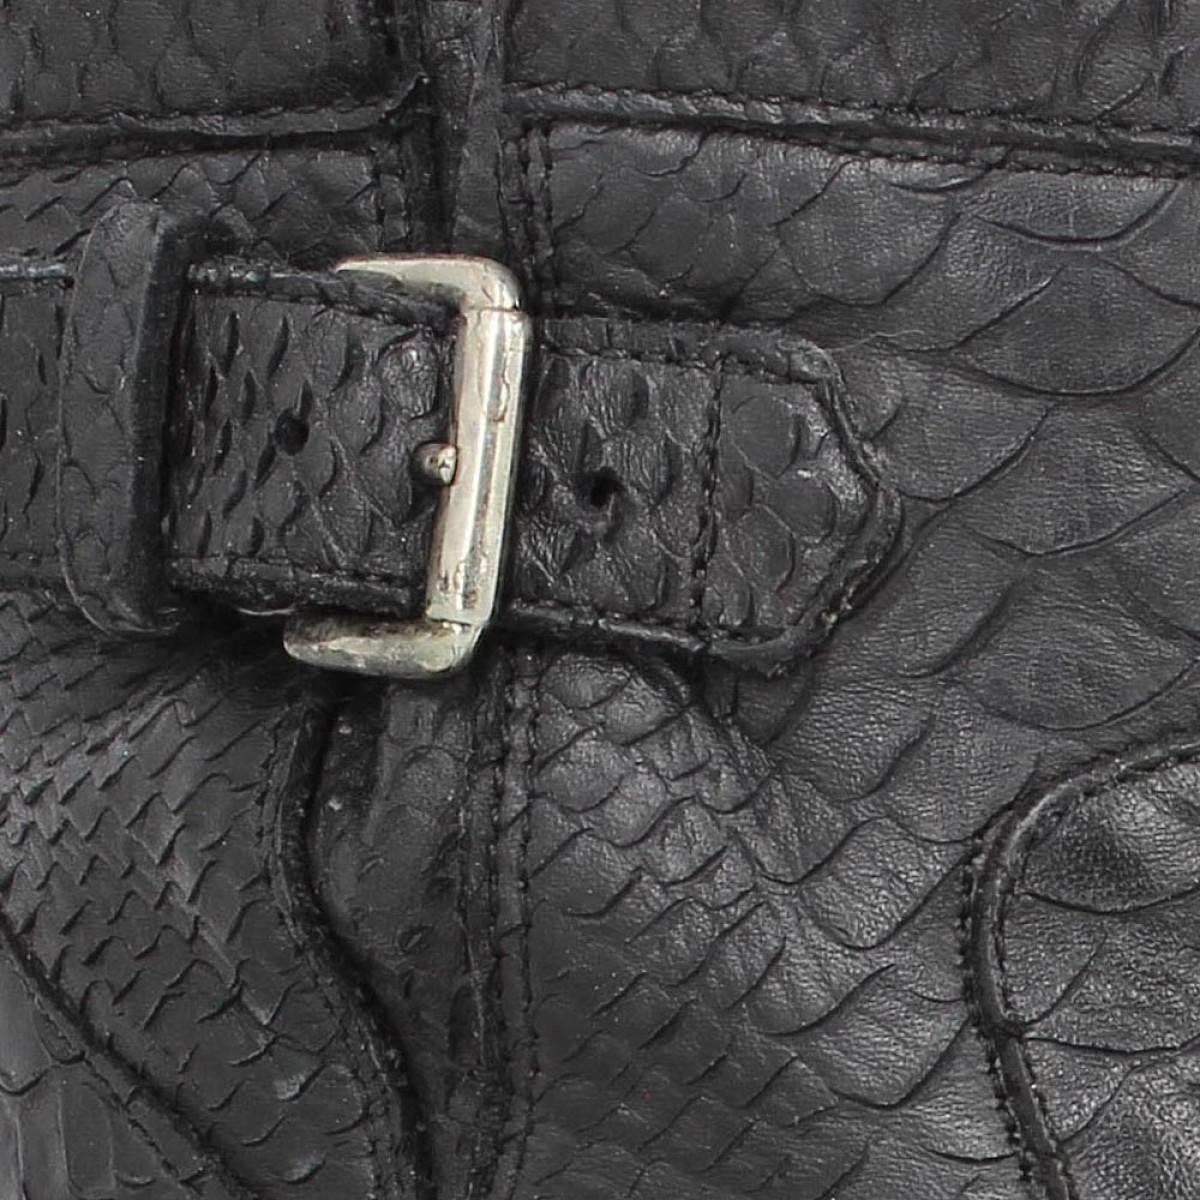 Femme Biker Diamente Small Noir Lance Chaussures 7 Wash Gero Free Awfx6p